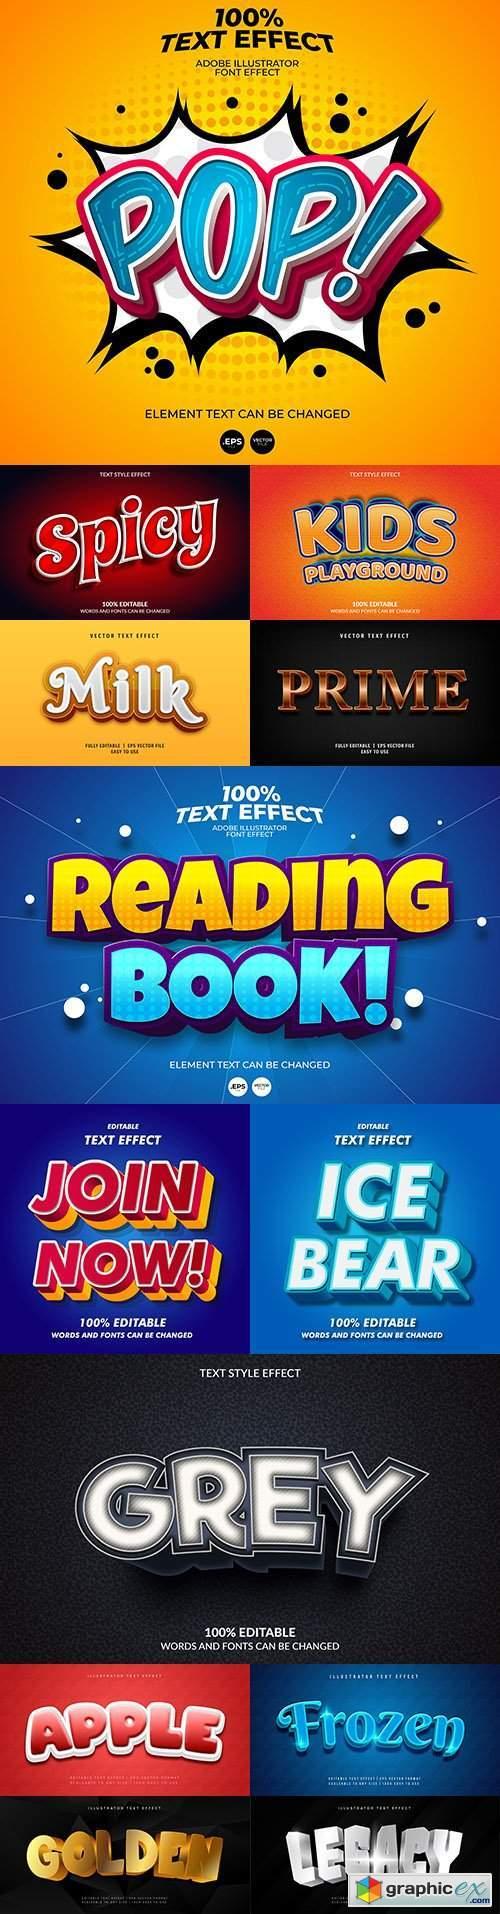 Editable font effect text collection illustration design 177